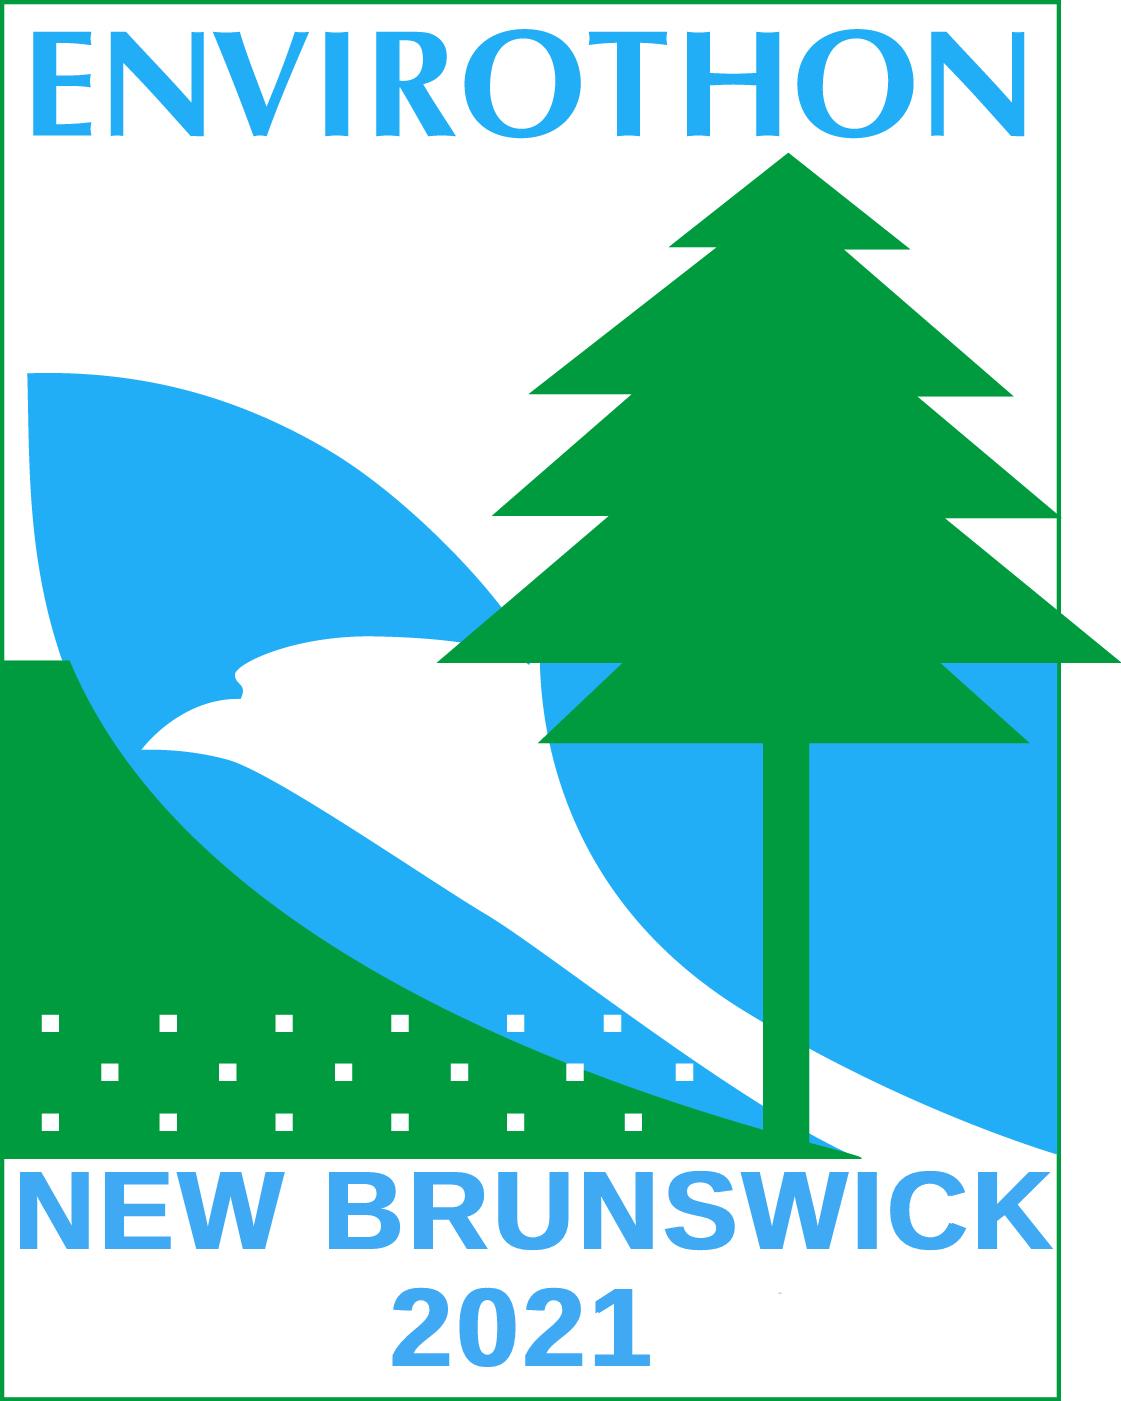 NCF-Envirothon_Logo - NB (2)